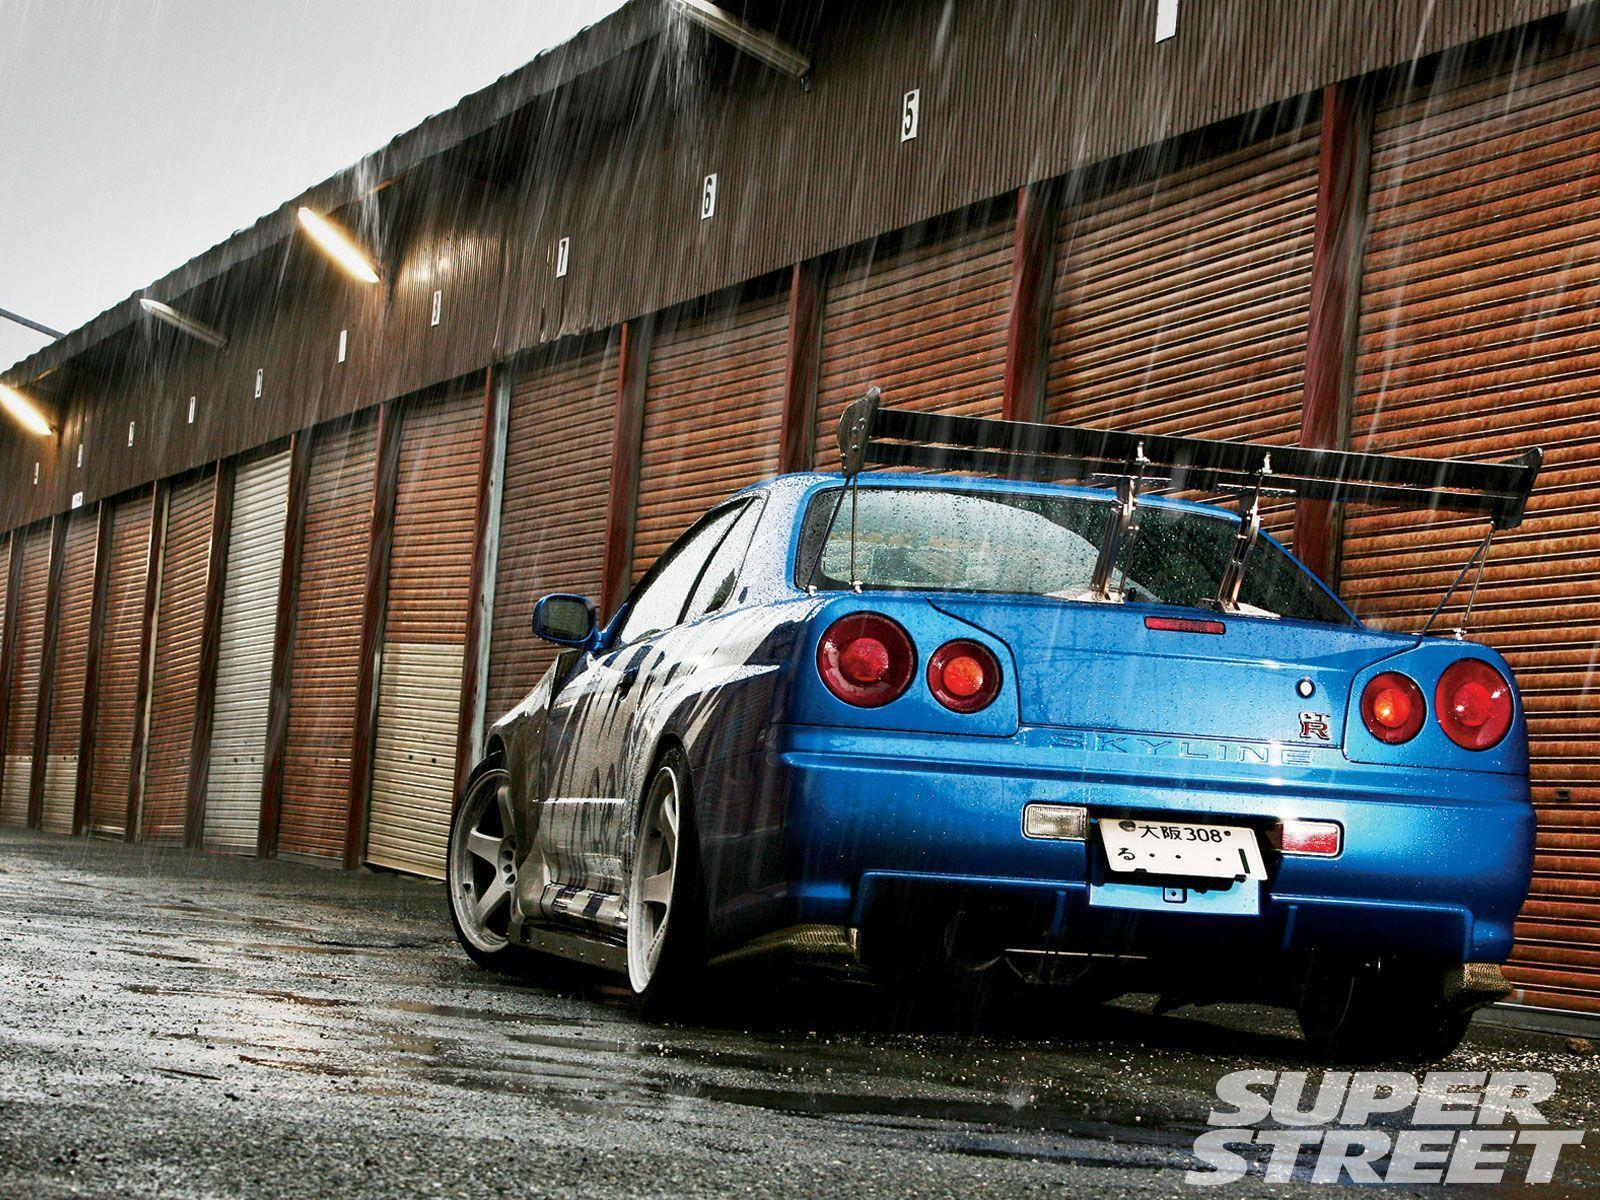 Nissan Skyline GTR R34 Wallpapers - Wallpaper Cave